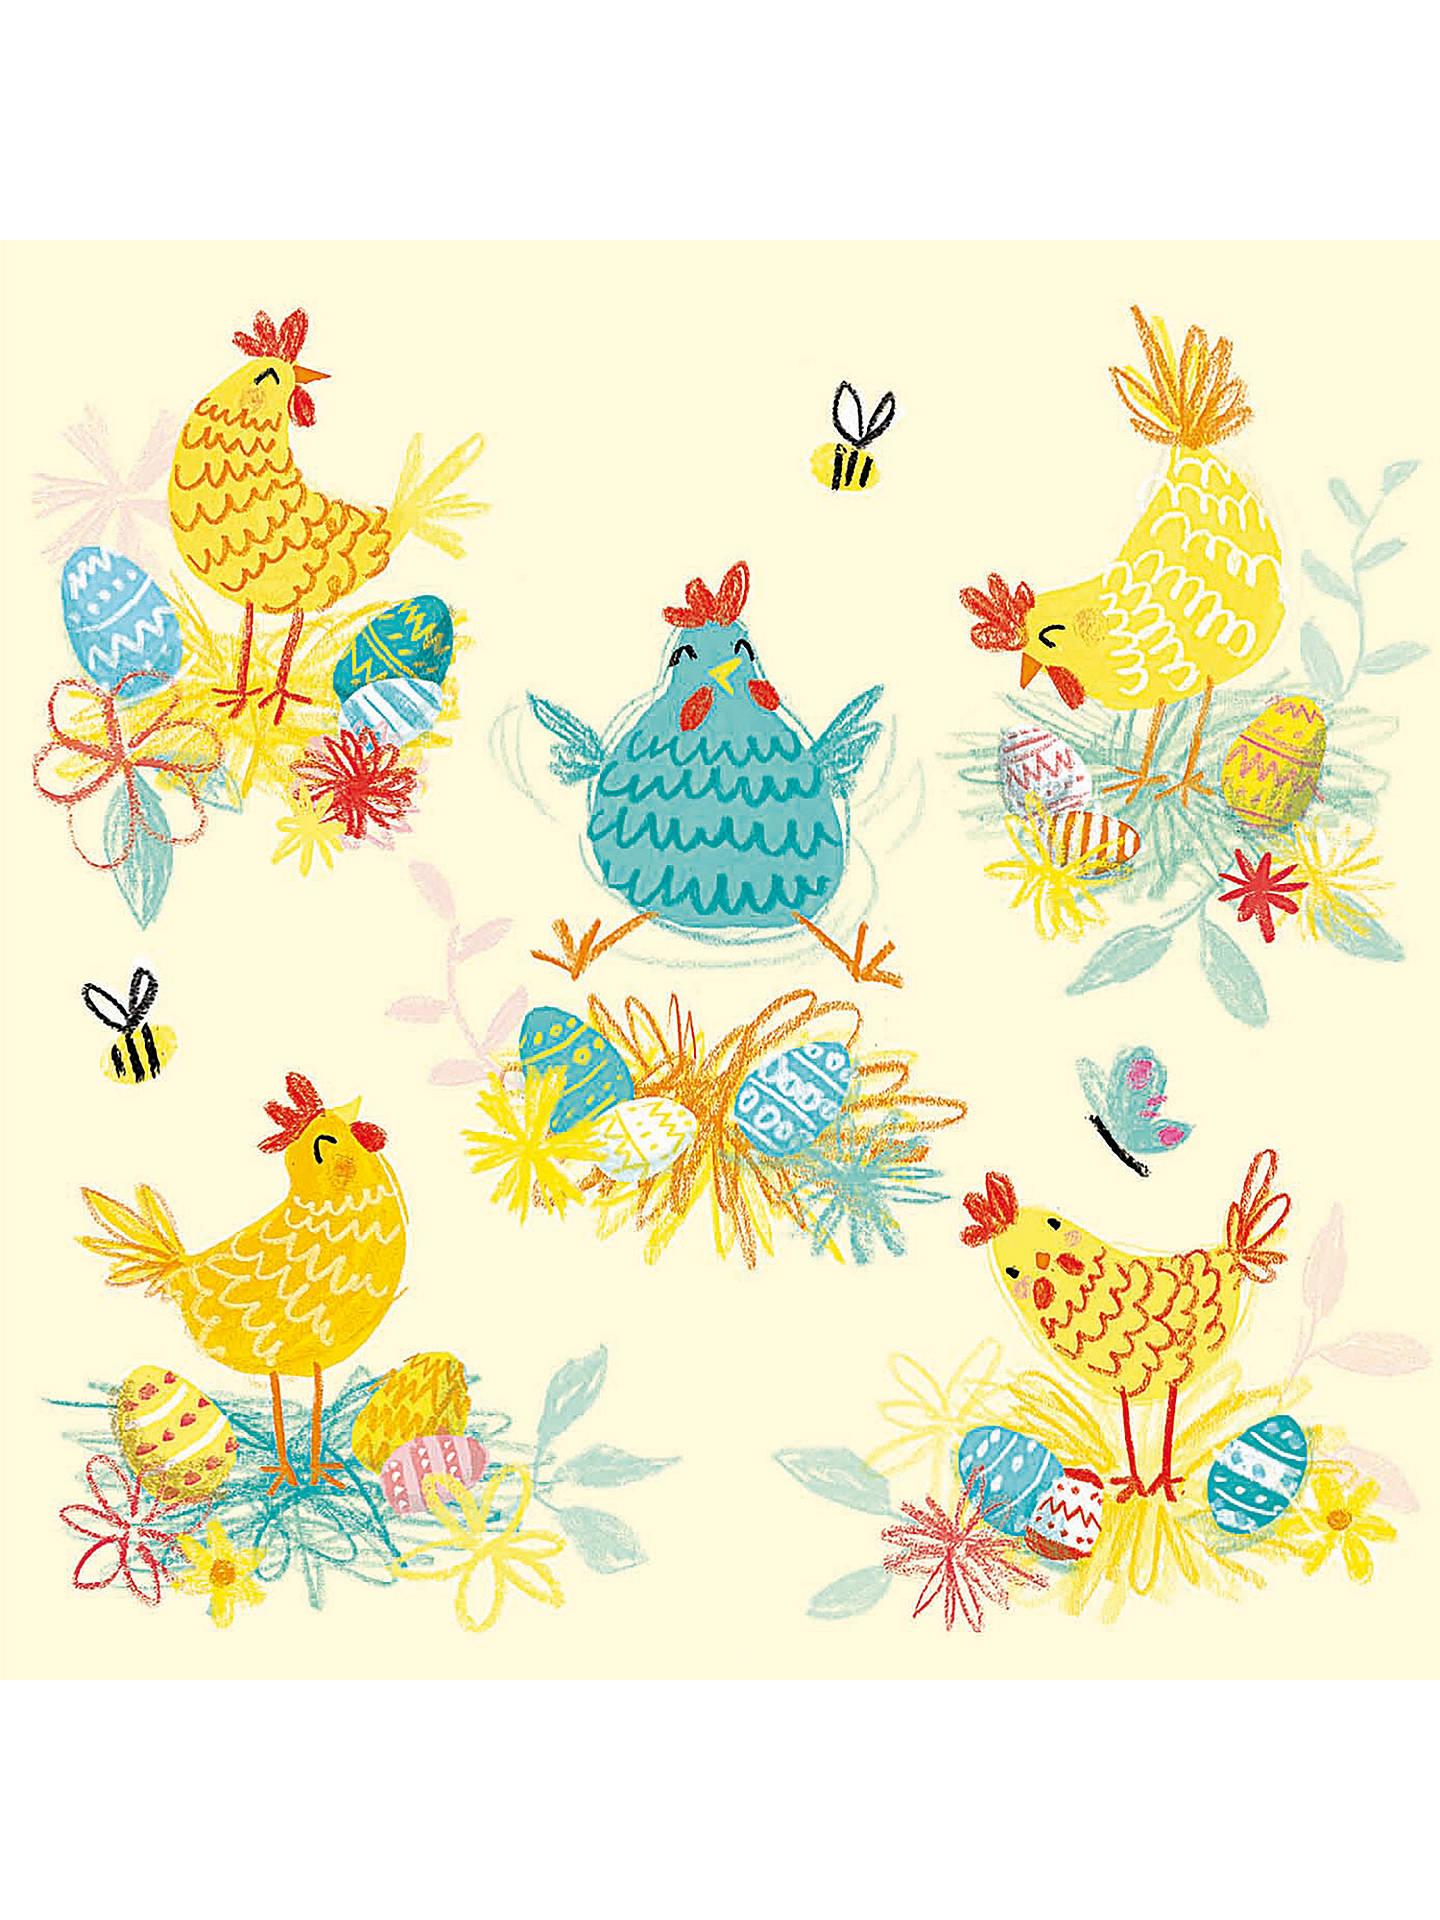 Woodmansterne Spring Chickens Easter Greeting Card At John Lewis